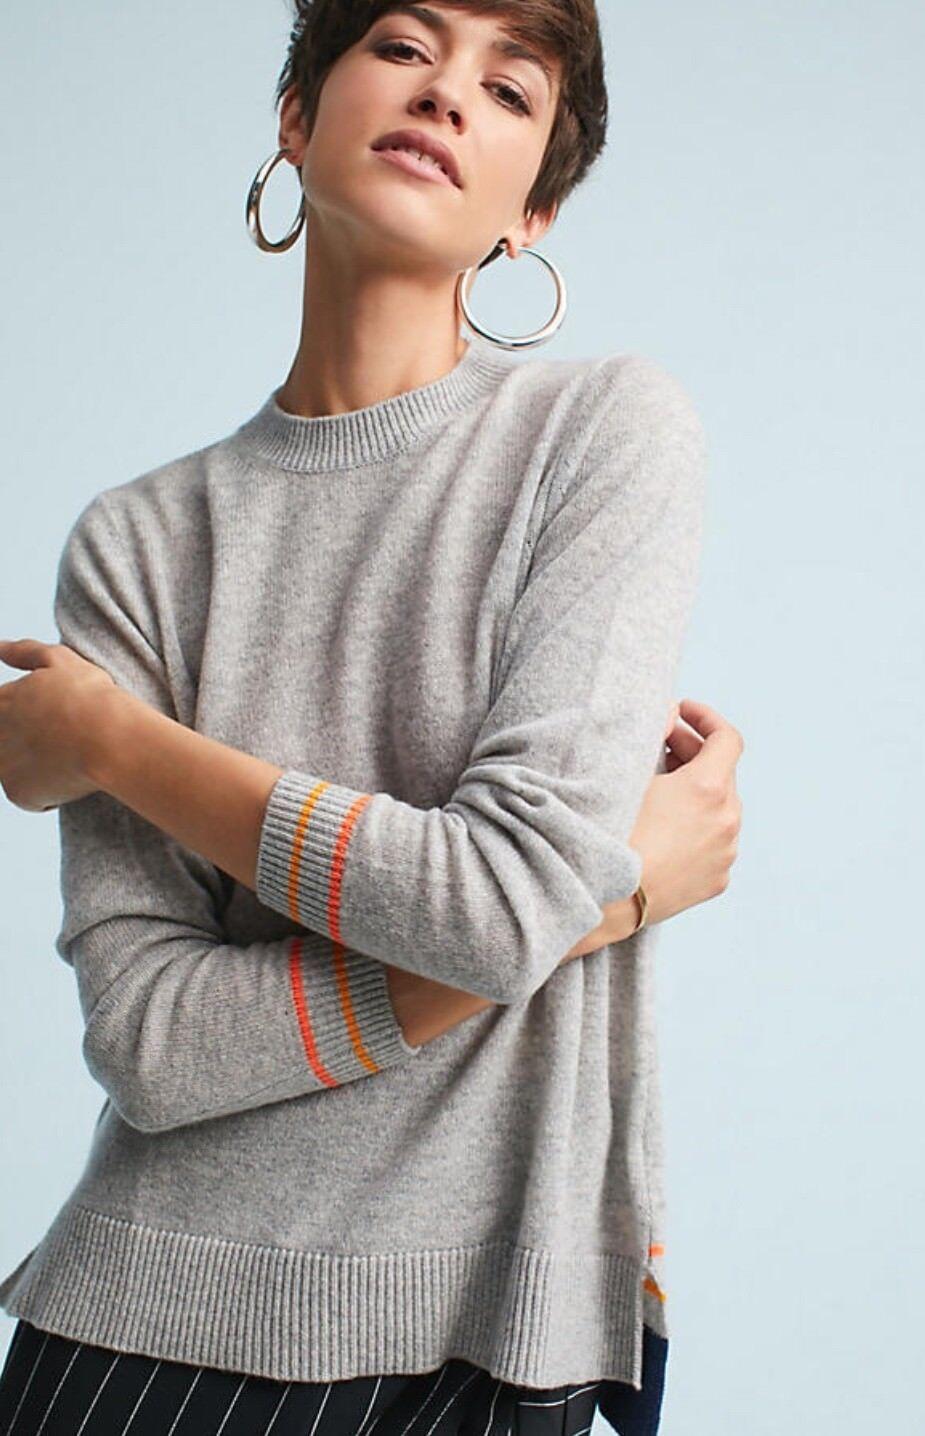 Nuevo Suéter  De Cachemira Suéter anthropologie Aguja Lori Tamaño Grande Jumper  costo real